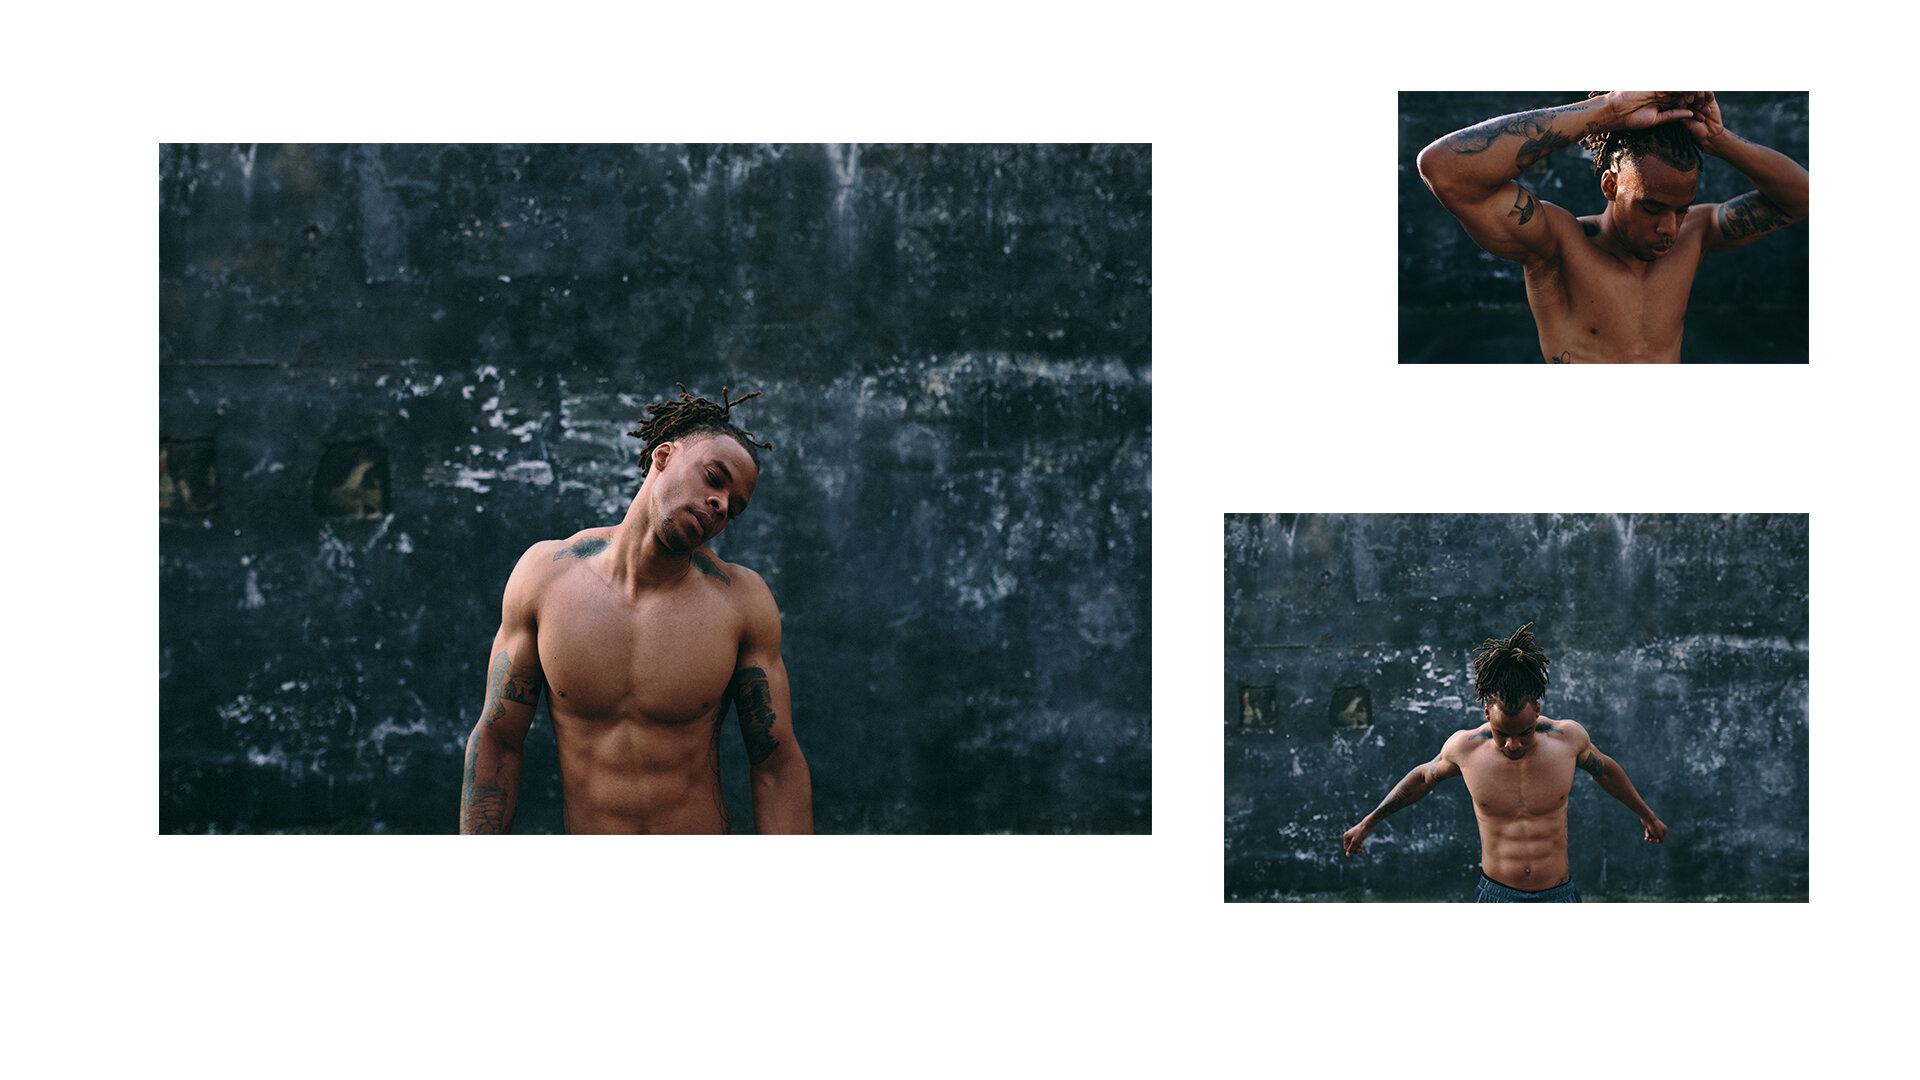 toby-butler-tobybutlerphoto-photography-fitness-lifestyle-lifestylephotographer-london-city-body-lululemon-yoga-stretch-emotion-physical-1.jpg